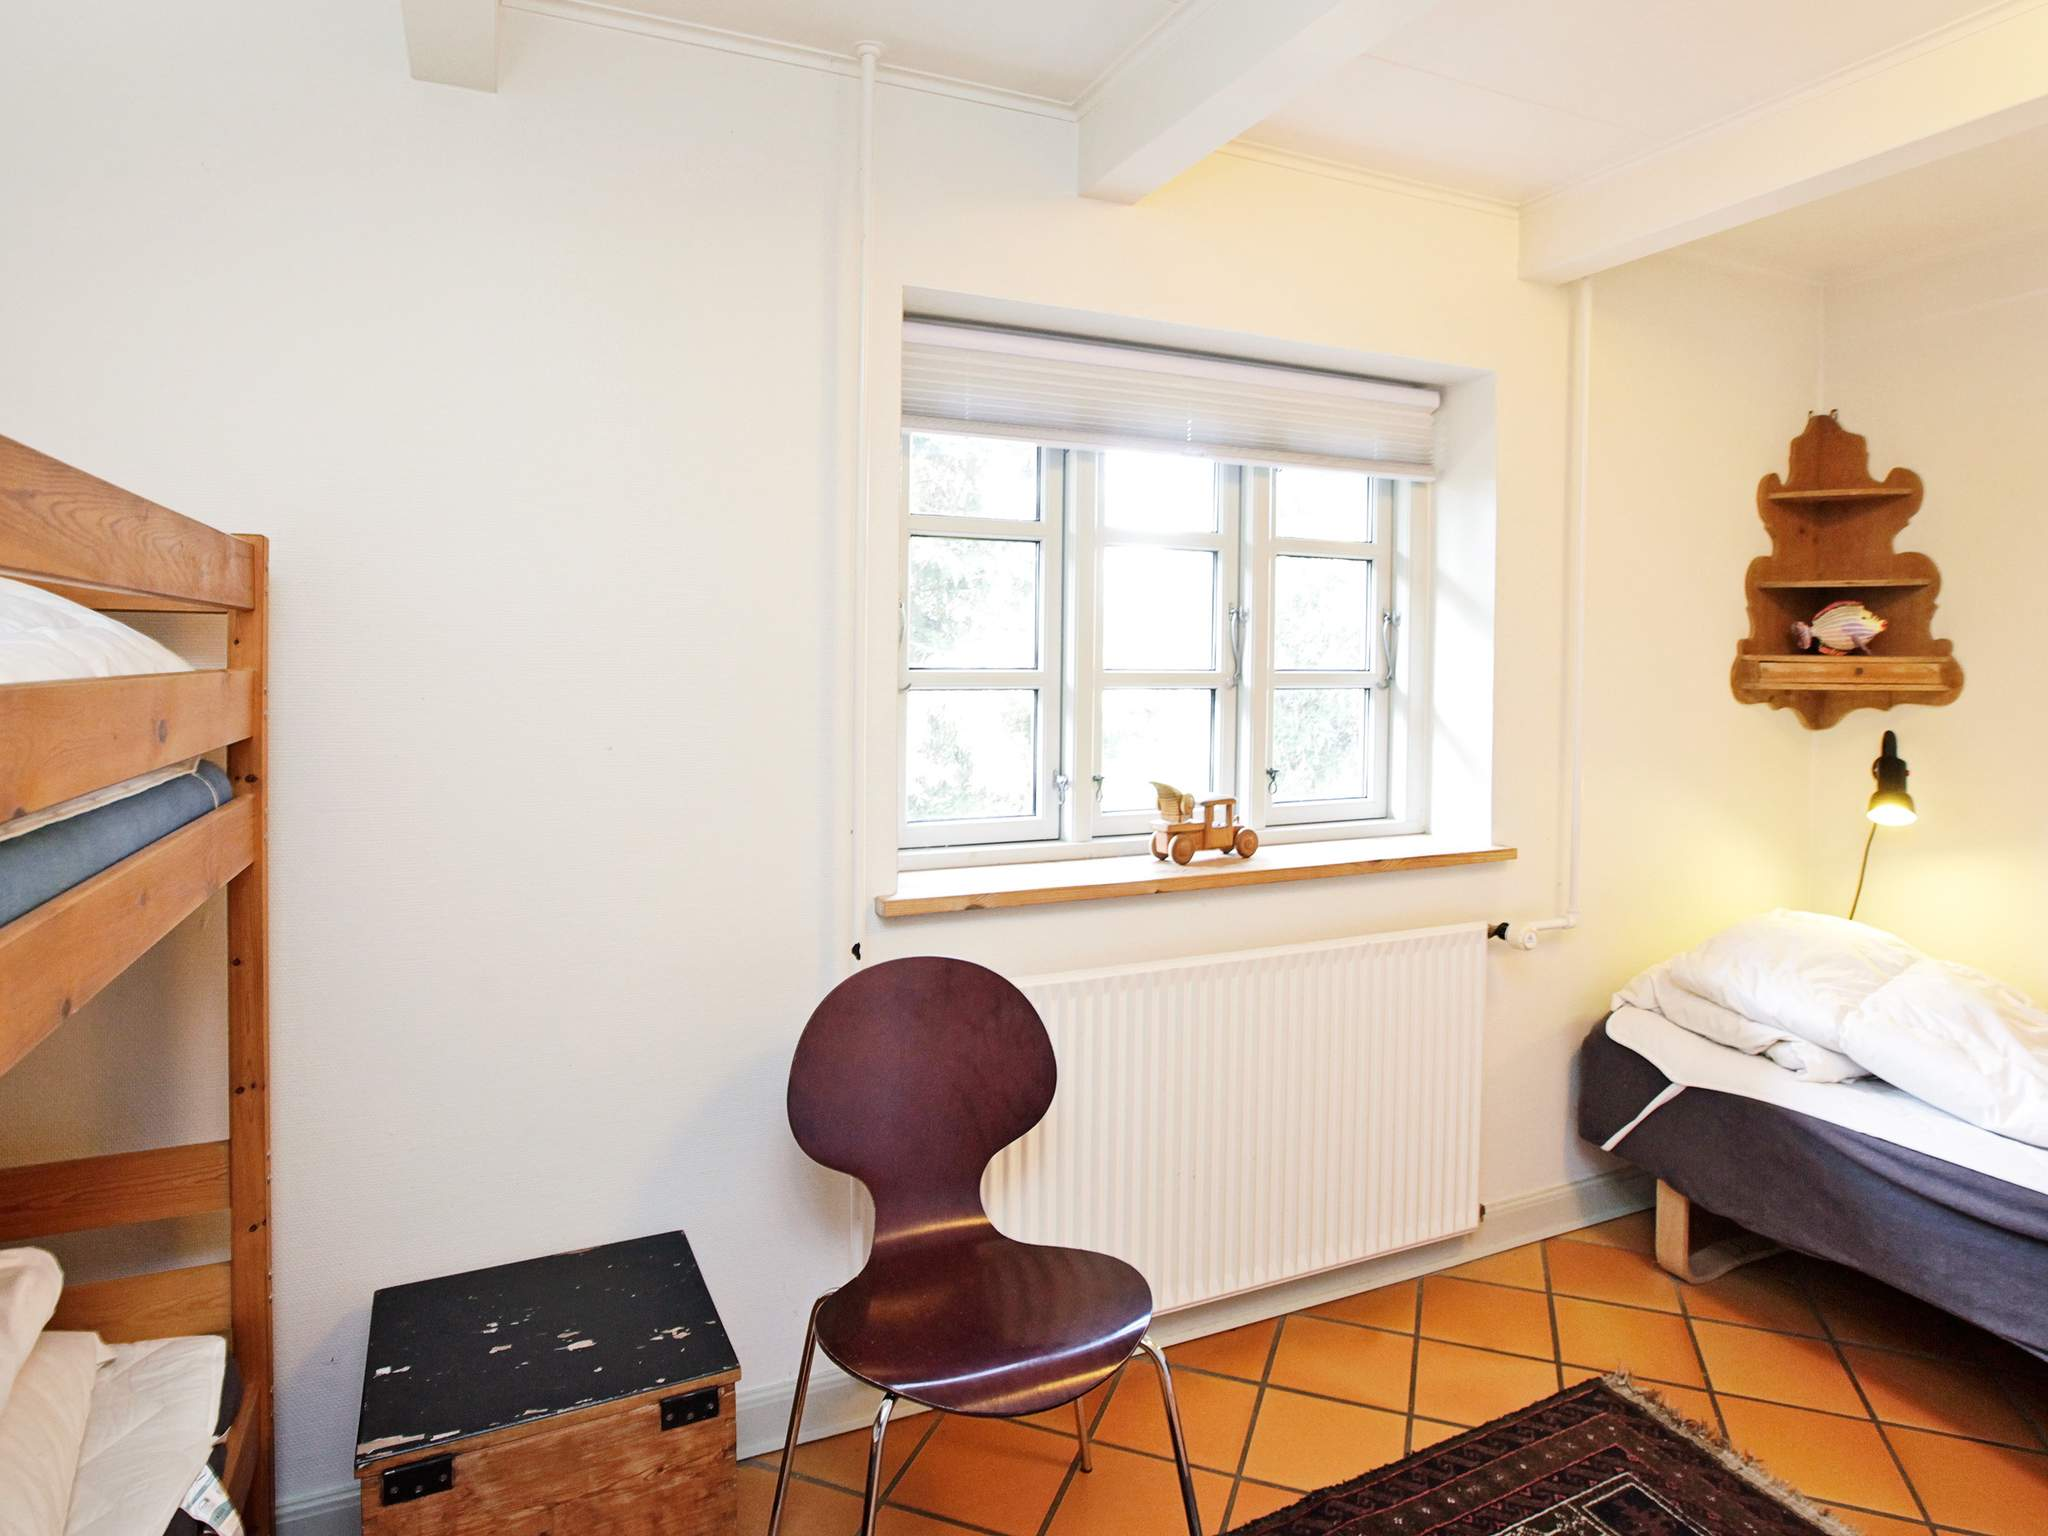 Maison de vacances Bovense (87483), Bovense, , Fionie, Danemark, image 13